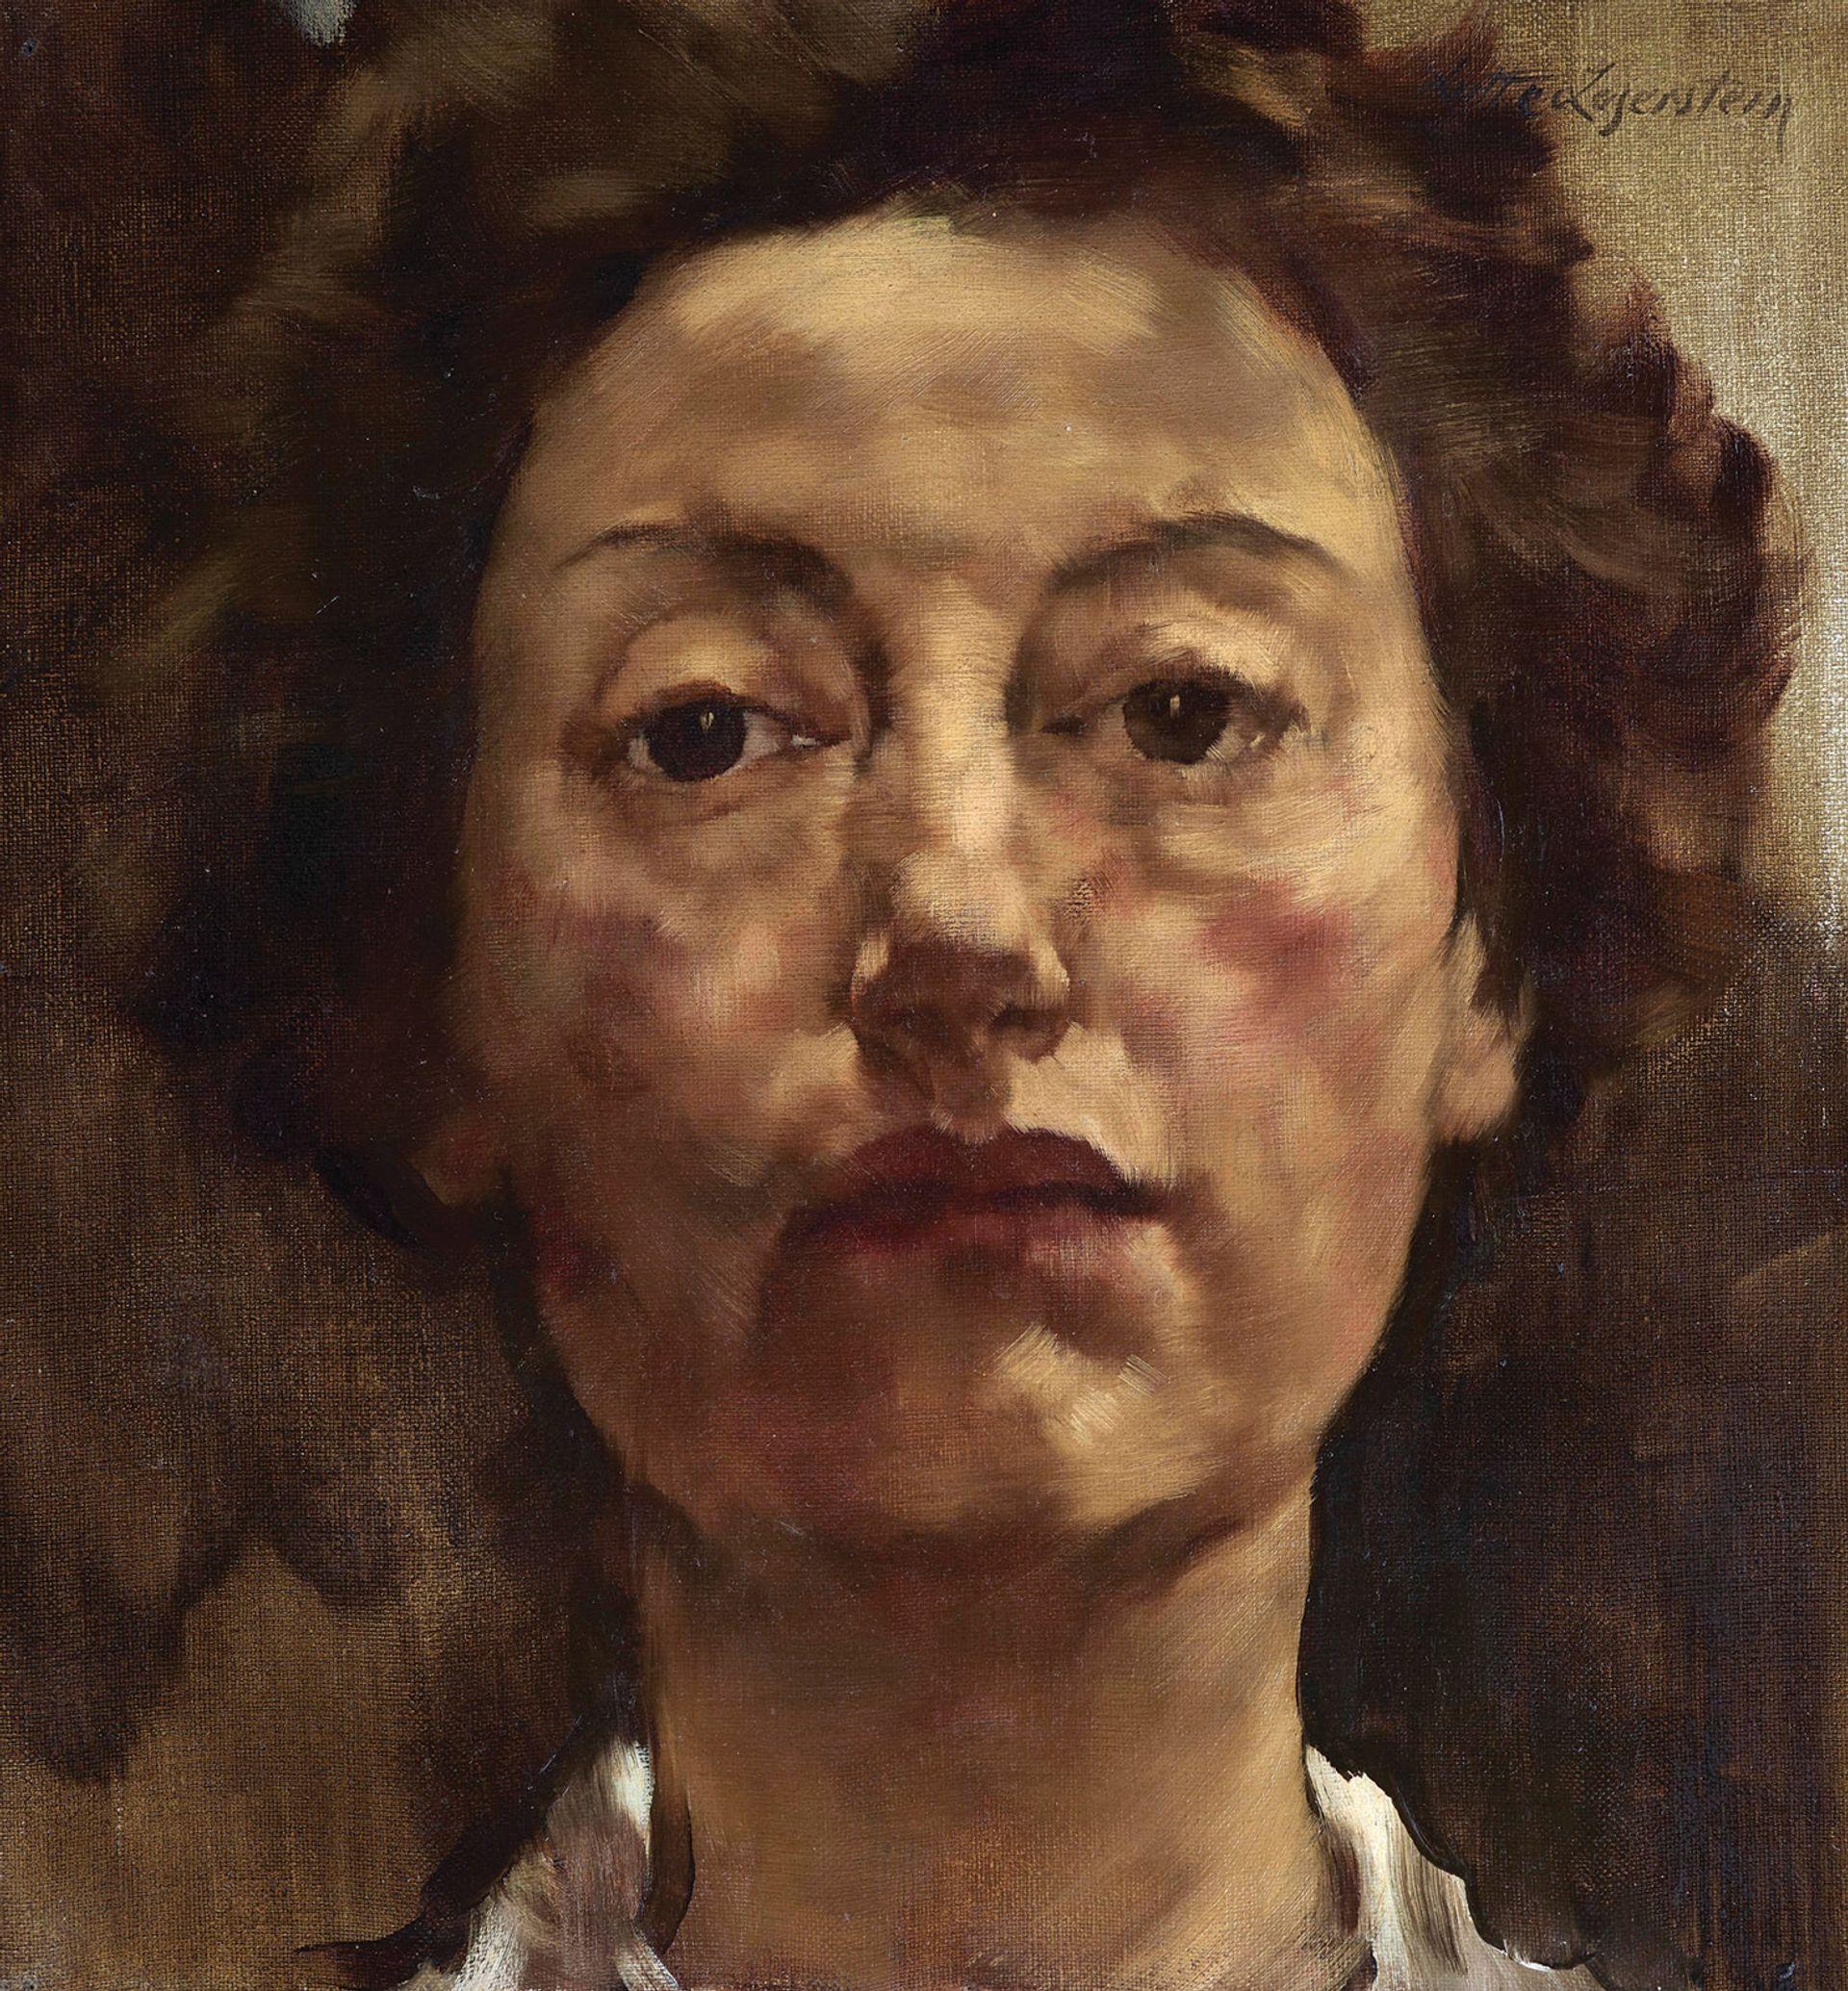 Lotte Laserstein, Self-portrait en face (1934-35) Courtesy of Agnew's